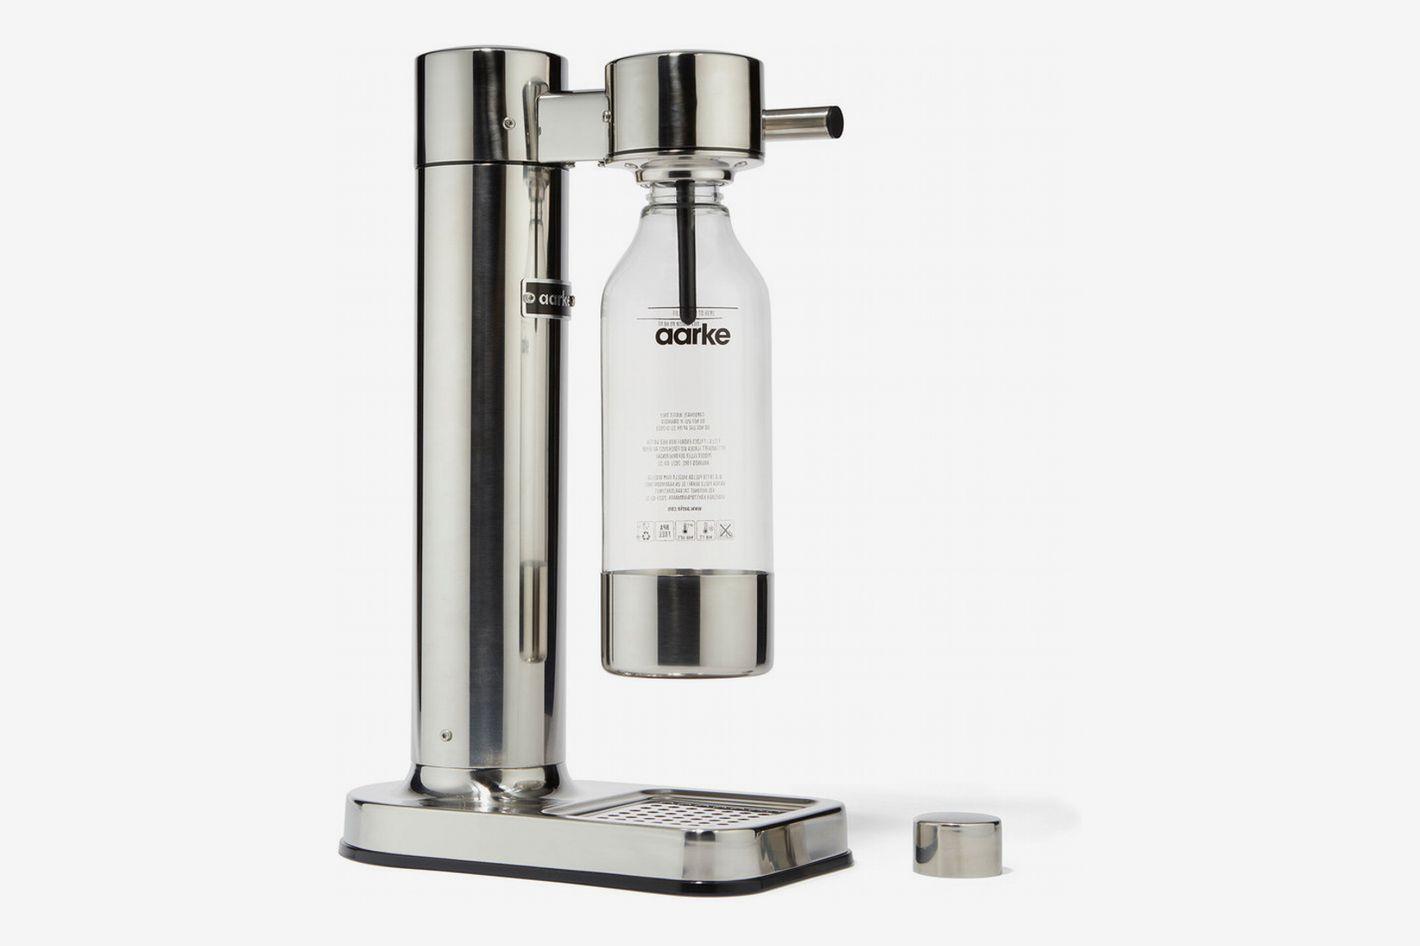 Aarke Stainless-Steel Sparkling Water Maker